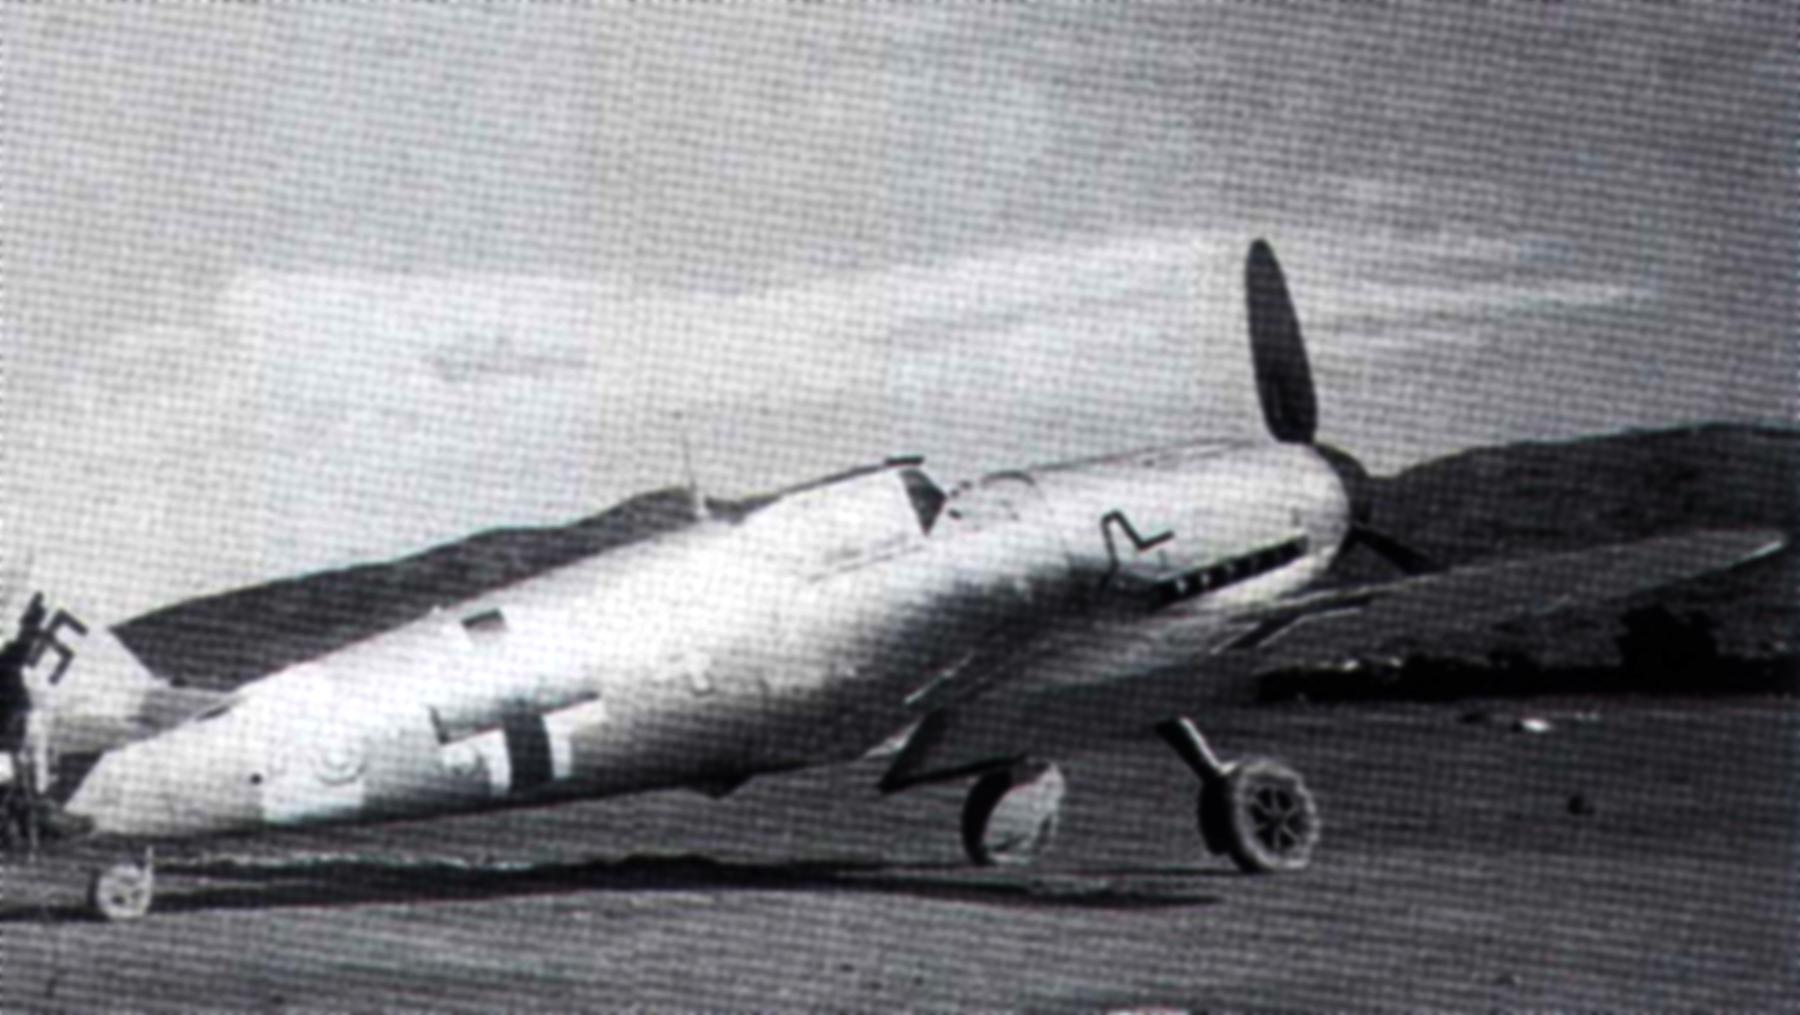 Messerschmitt Bf 109F4Trop 9.JG27 Yellow 4 Andreas Kuhn MIA WNr 7186 Daba Egypt Nov 1942 01